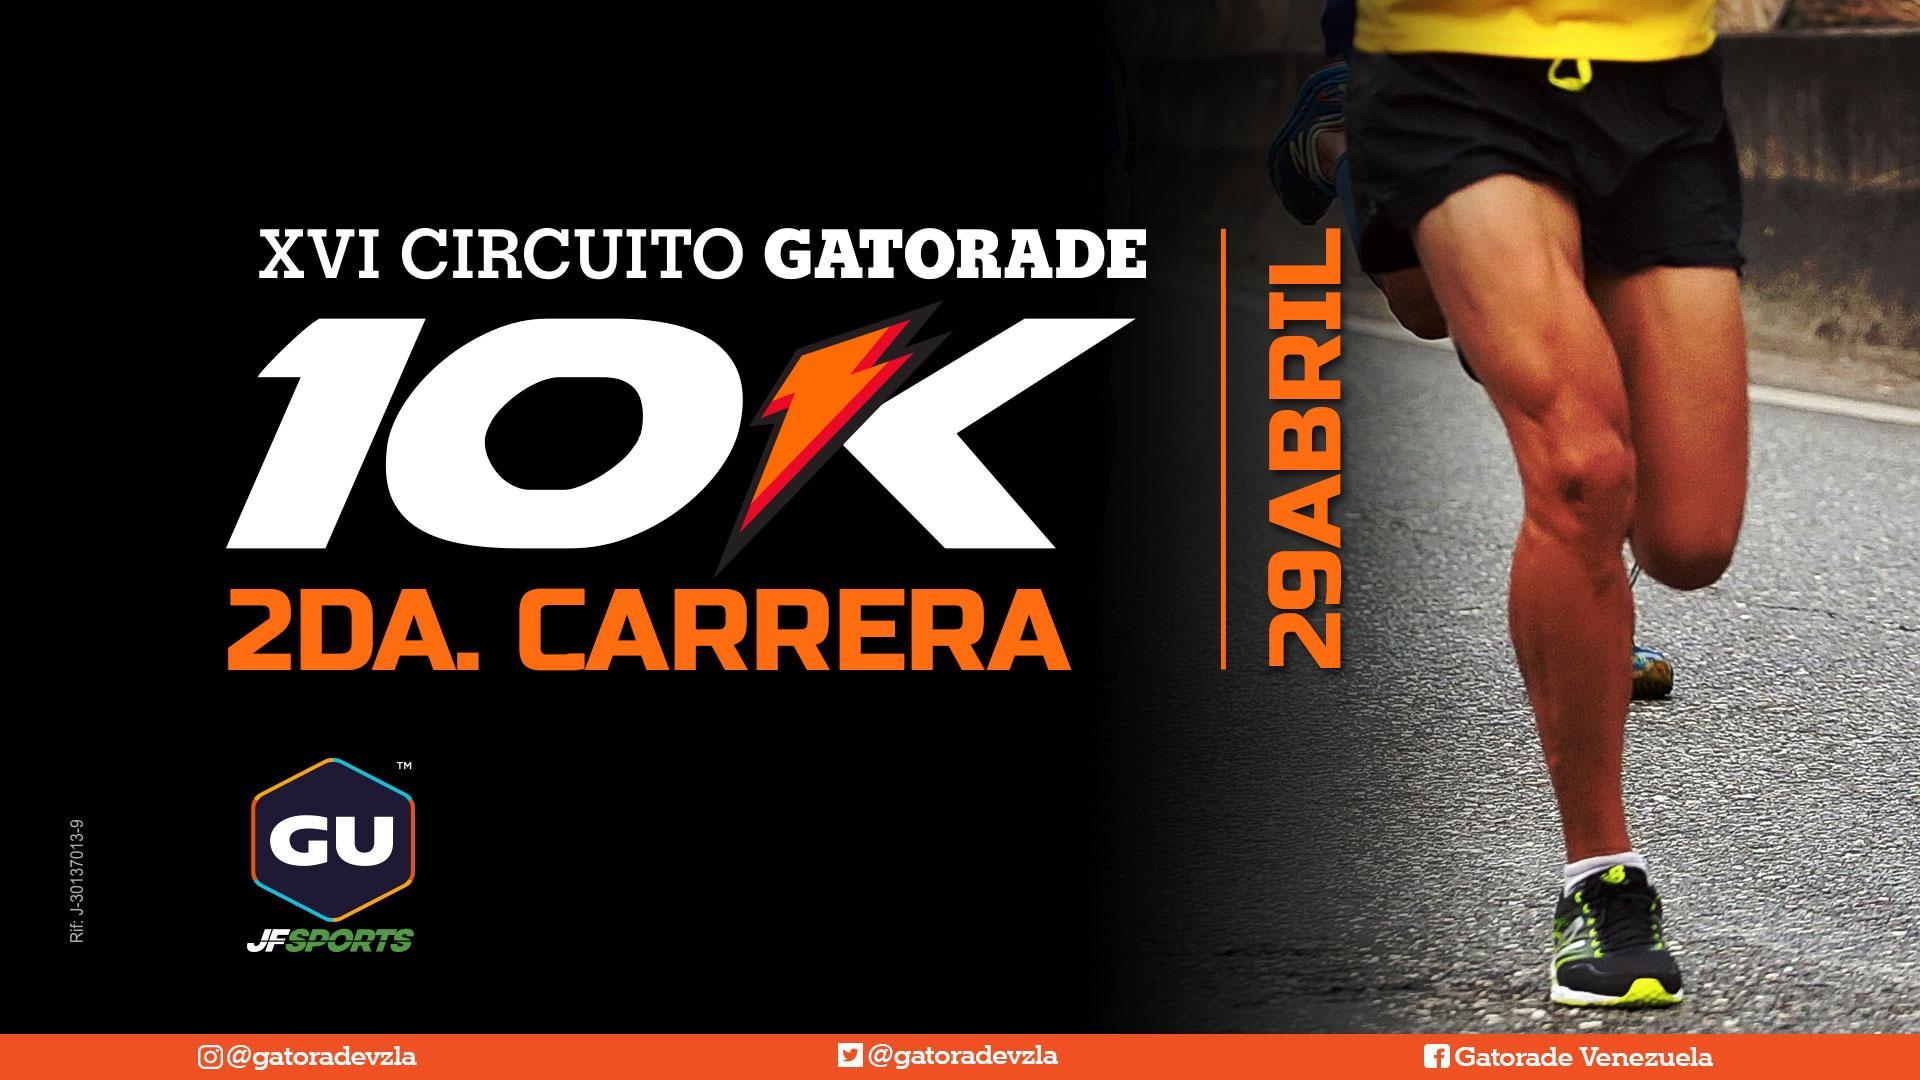 2da Carrera del XVI Circuito Gatorade 10K - Copa GU JF Sports